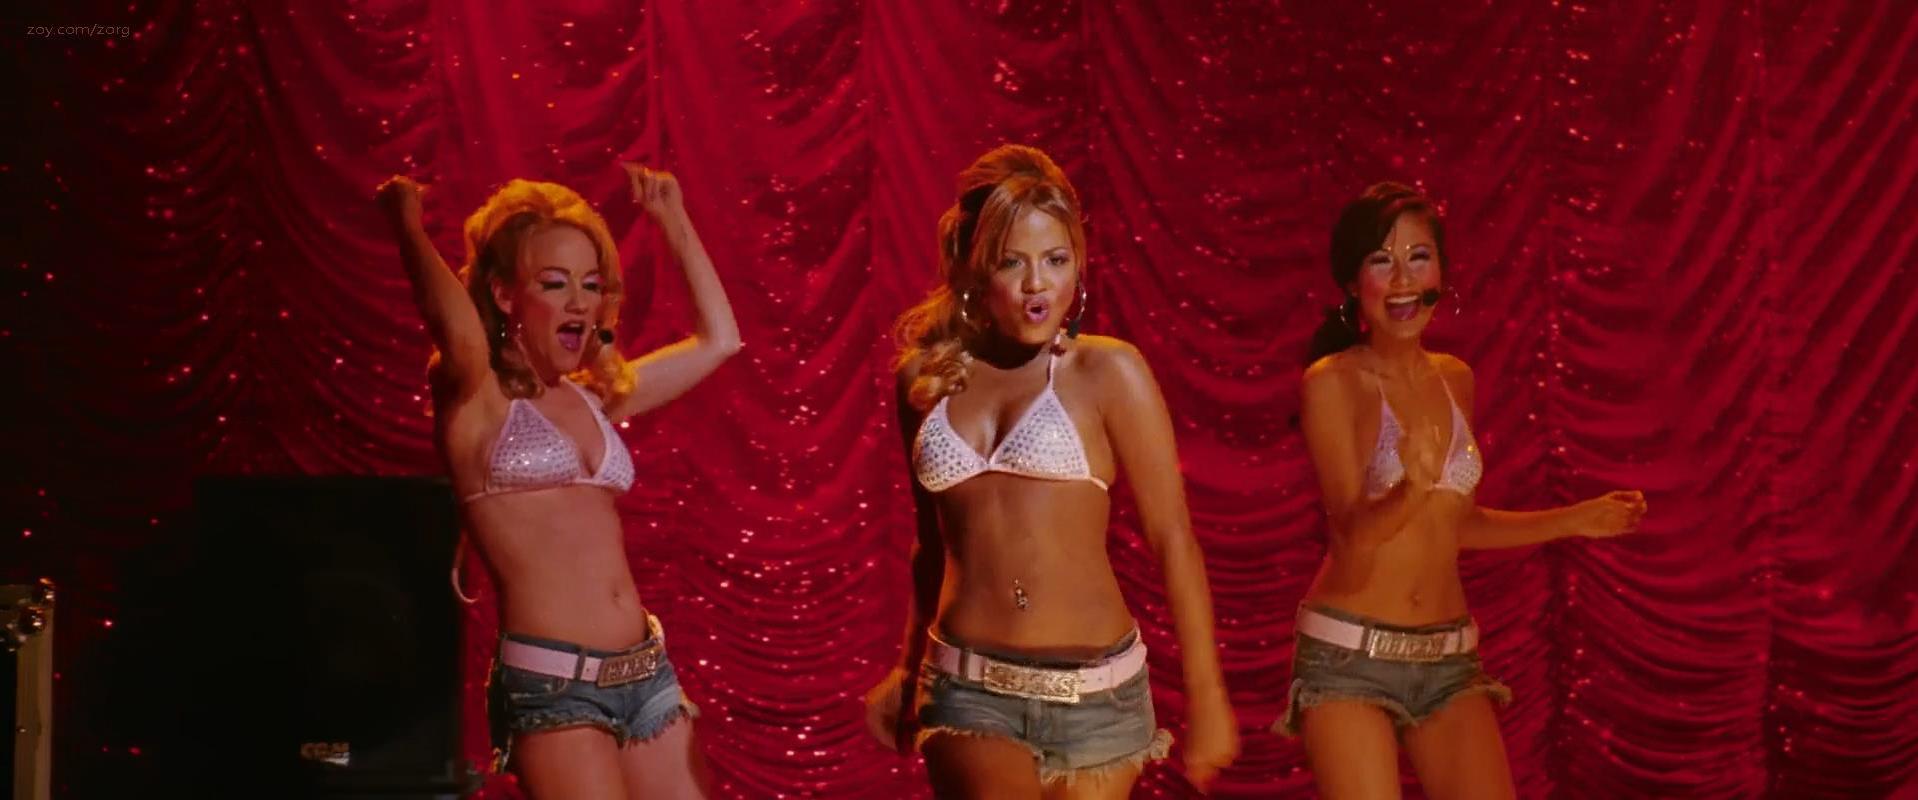 Uma Thurman sexy, Christina Milian sexy - Be Cool (2005)